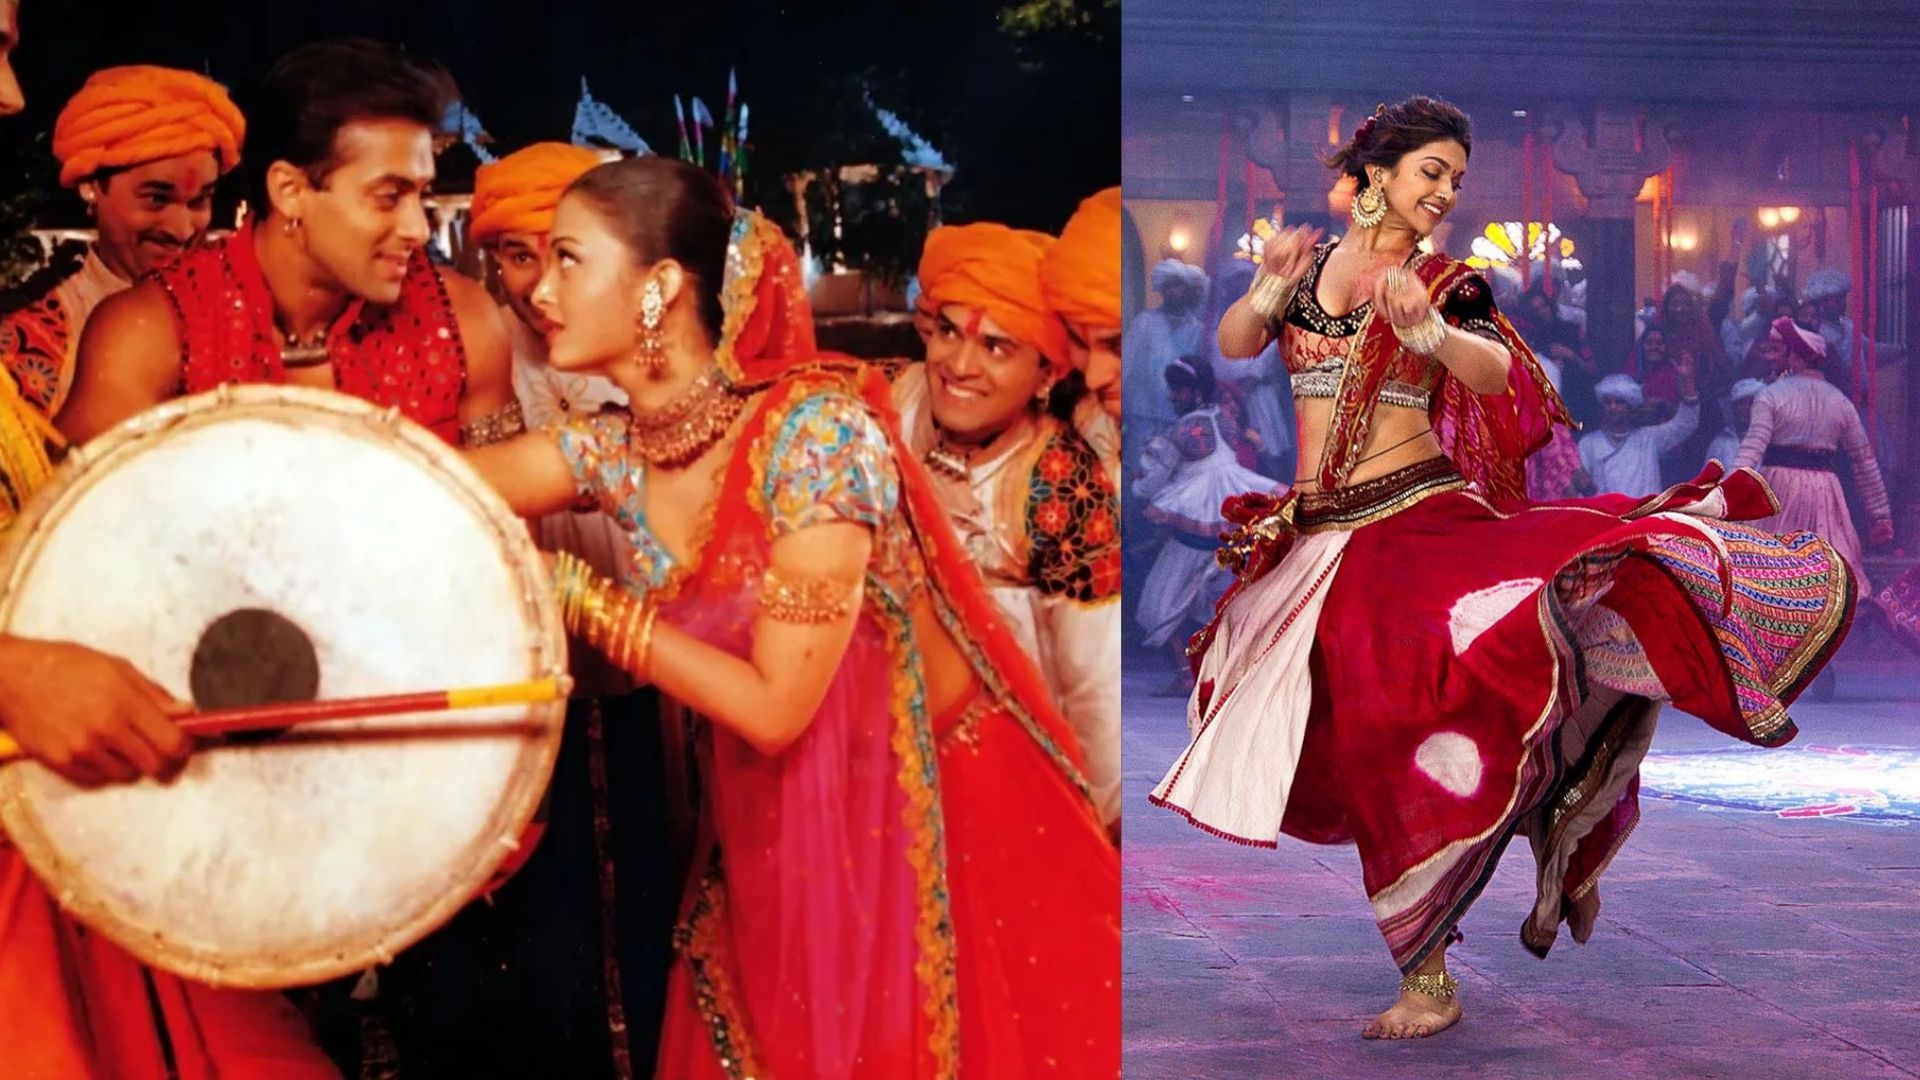 Navratri 2021: Aishwarya Rai Bachchan To Deepika Padukone- Top Celebrity Garba Looks To Take Tips From